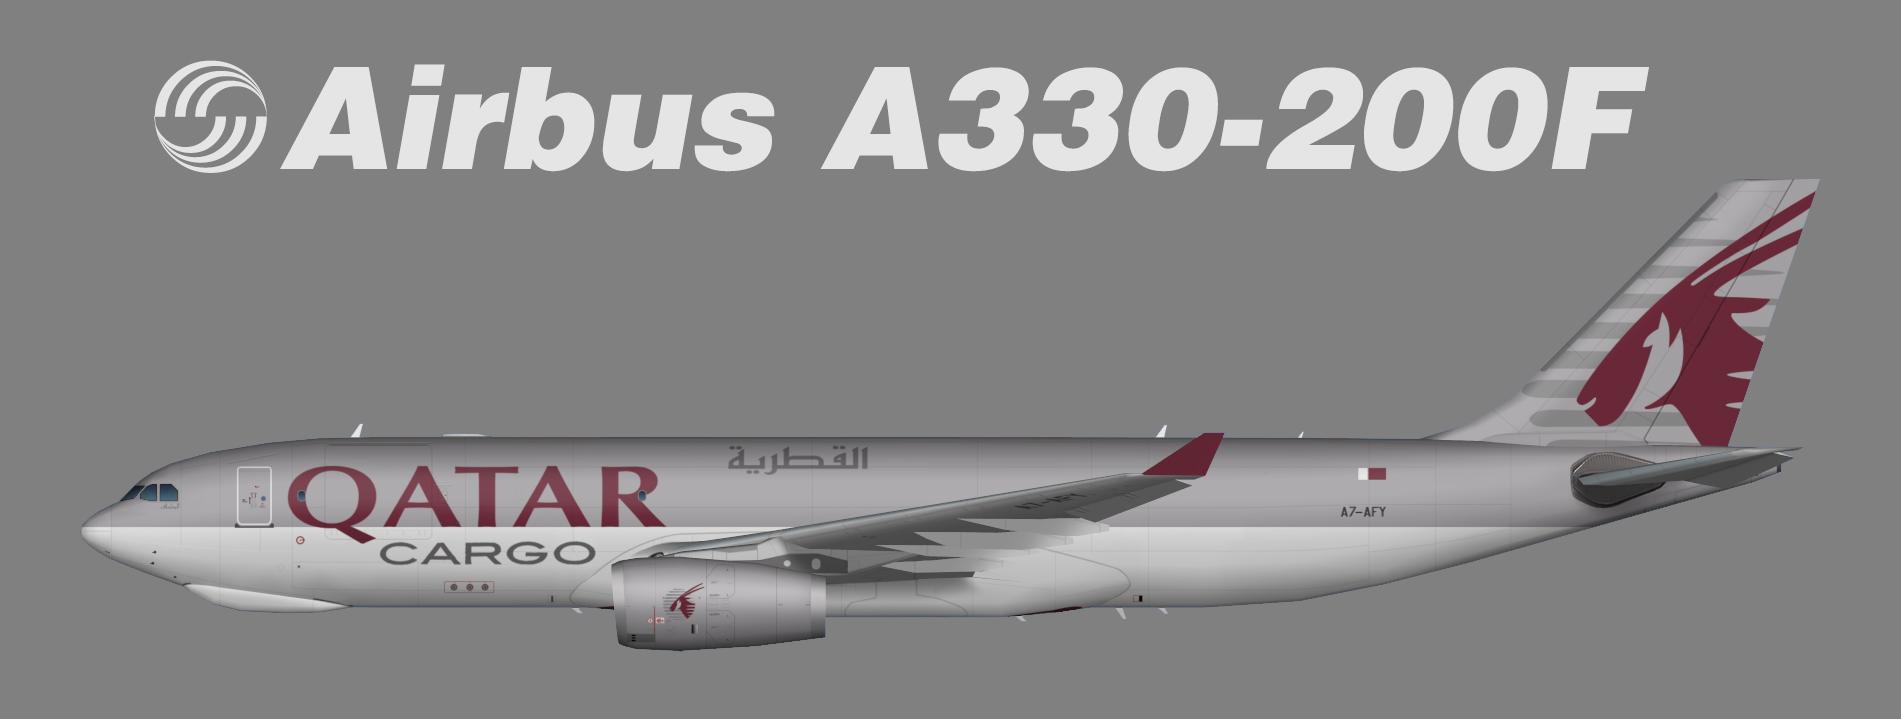 qatar a380 tribute fsx - photo #19